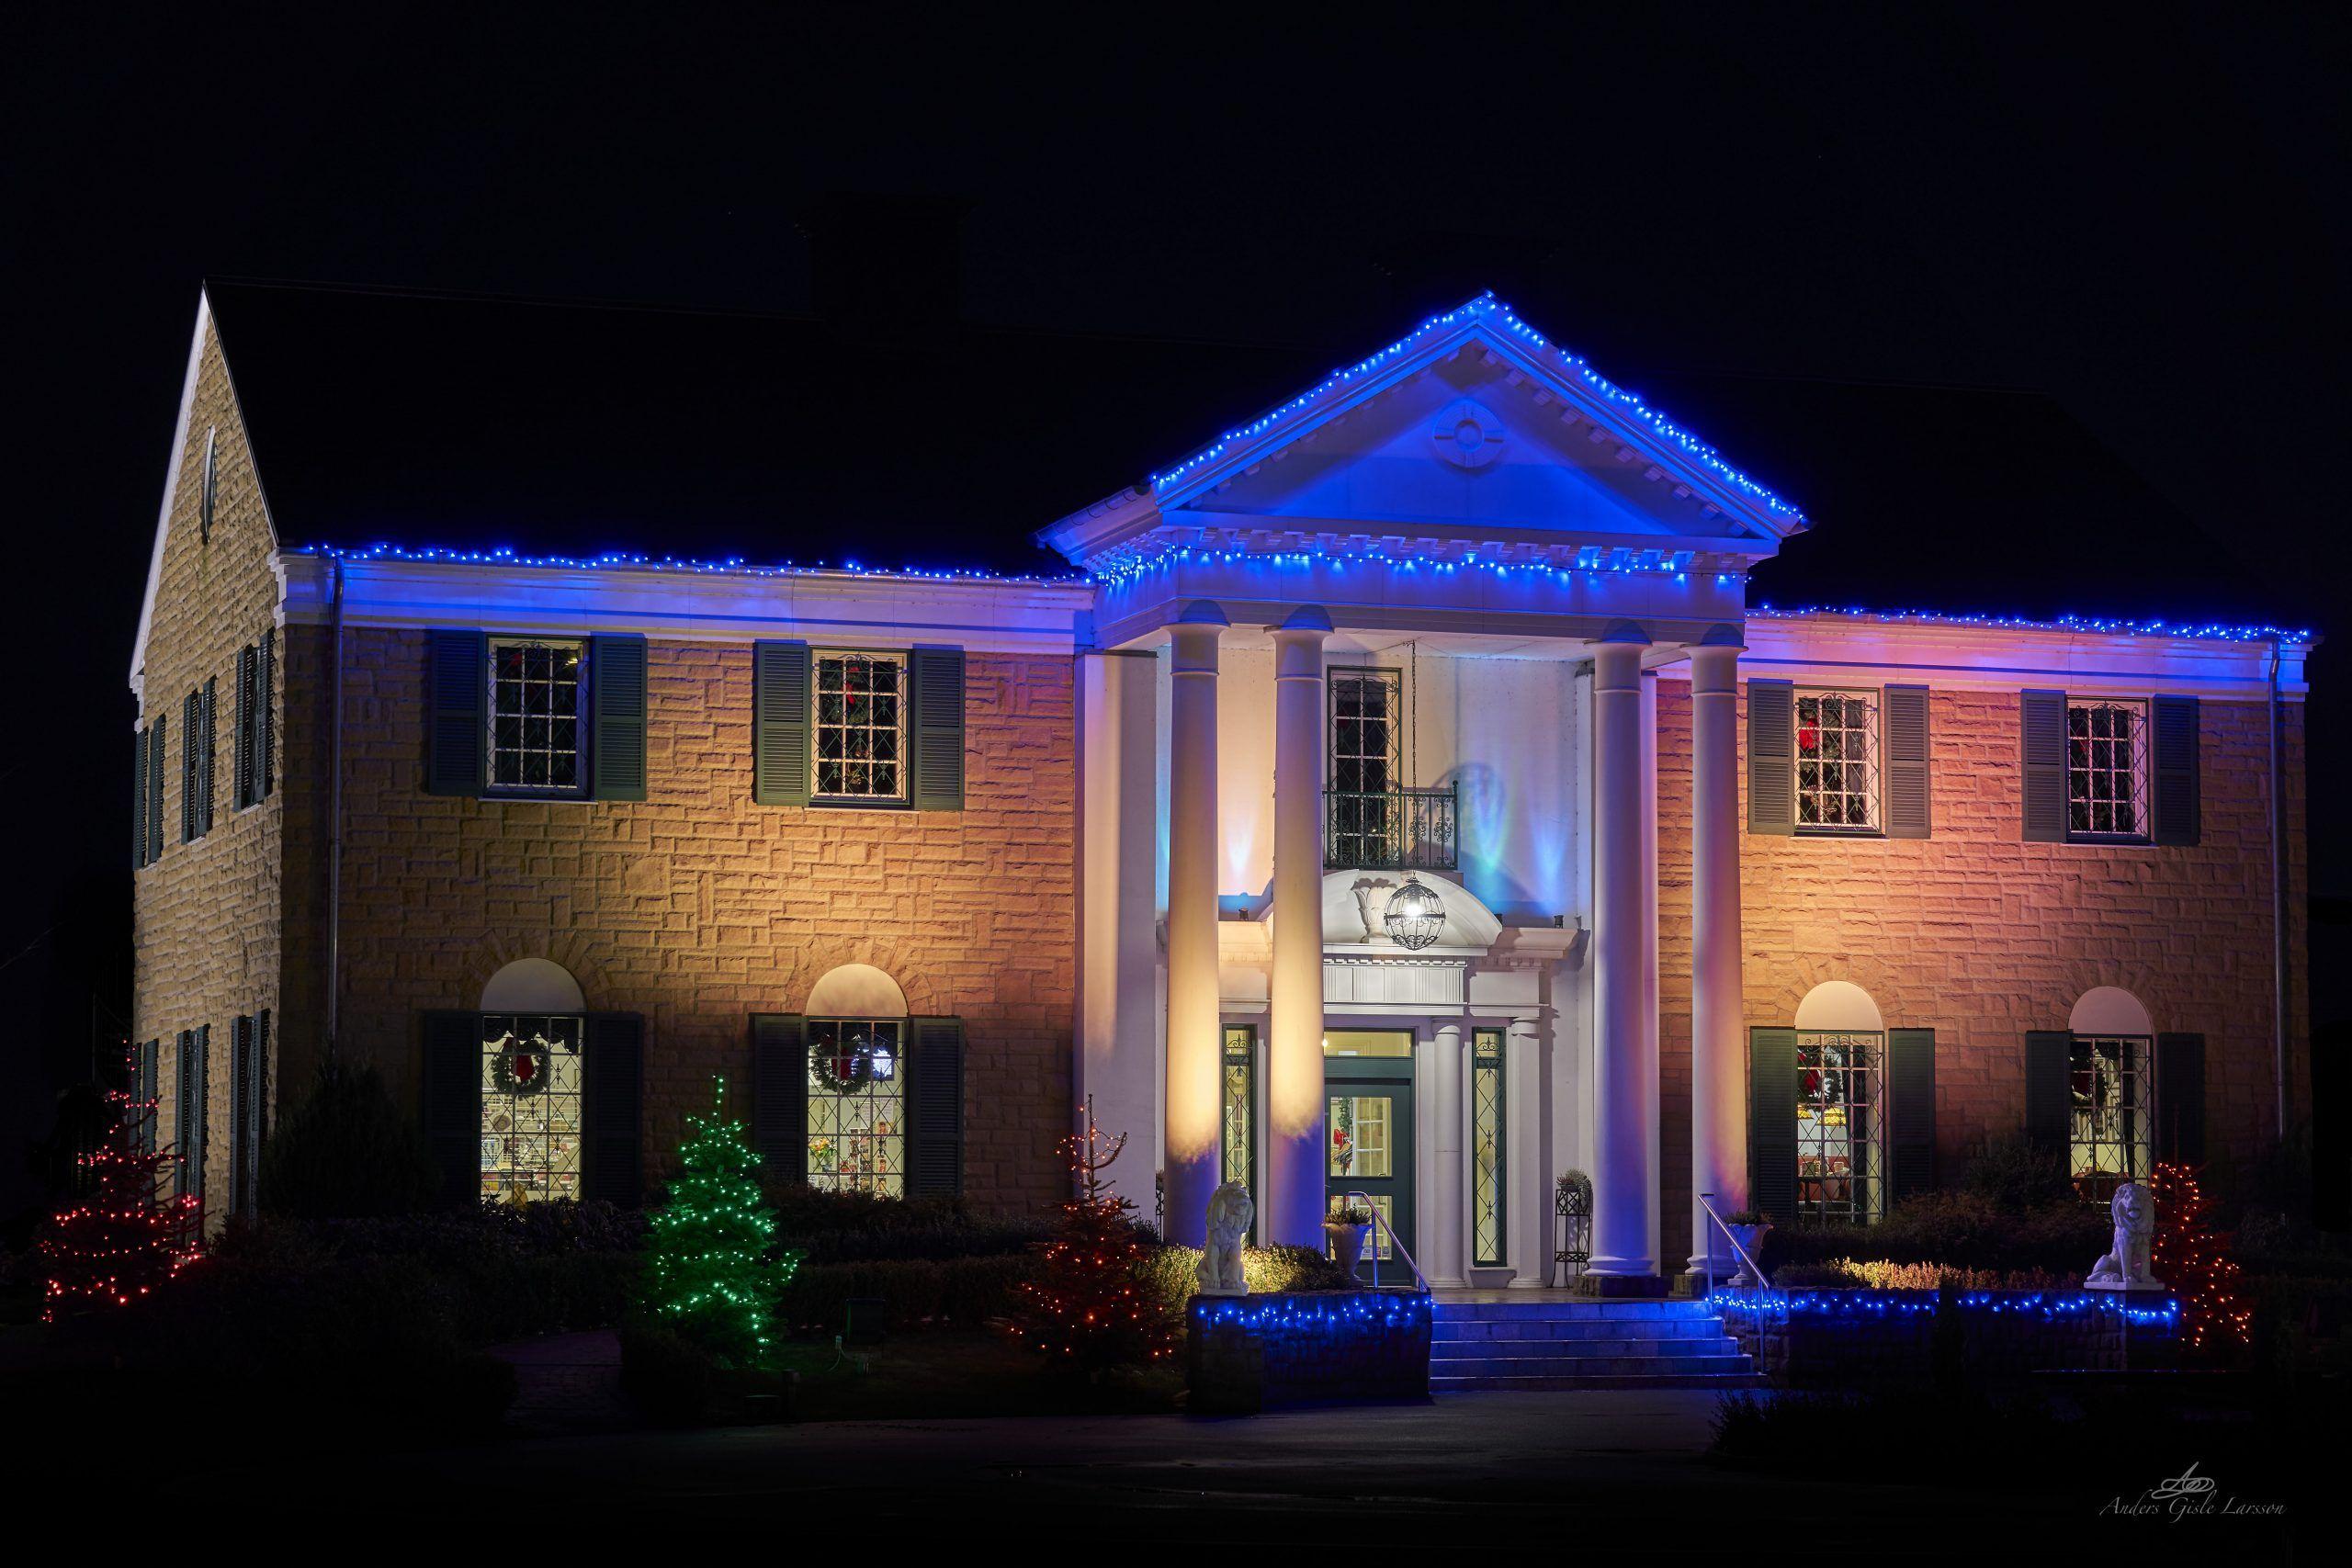 104/365, Memphis Mansion, Randers